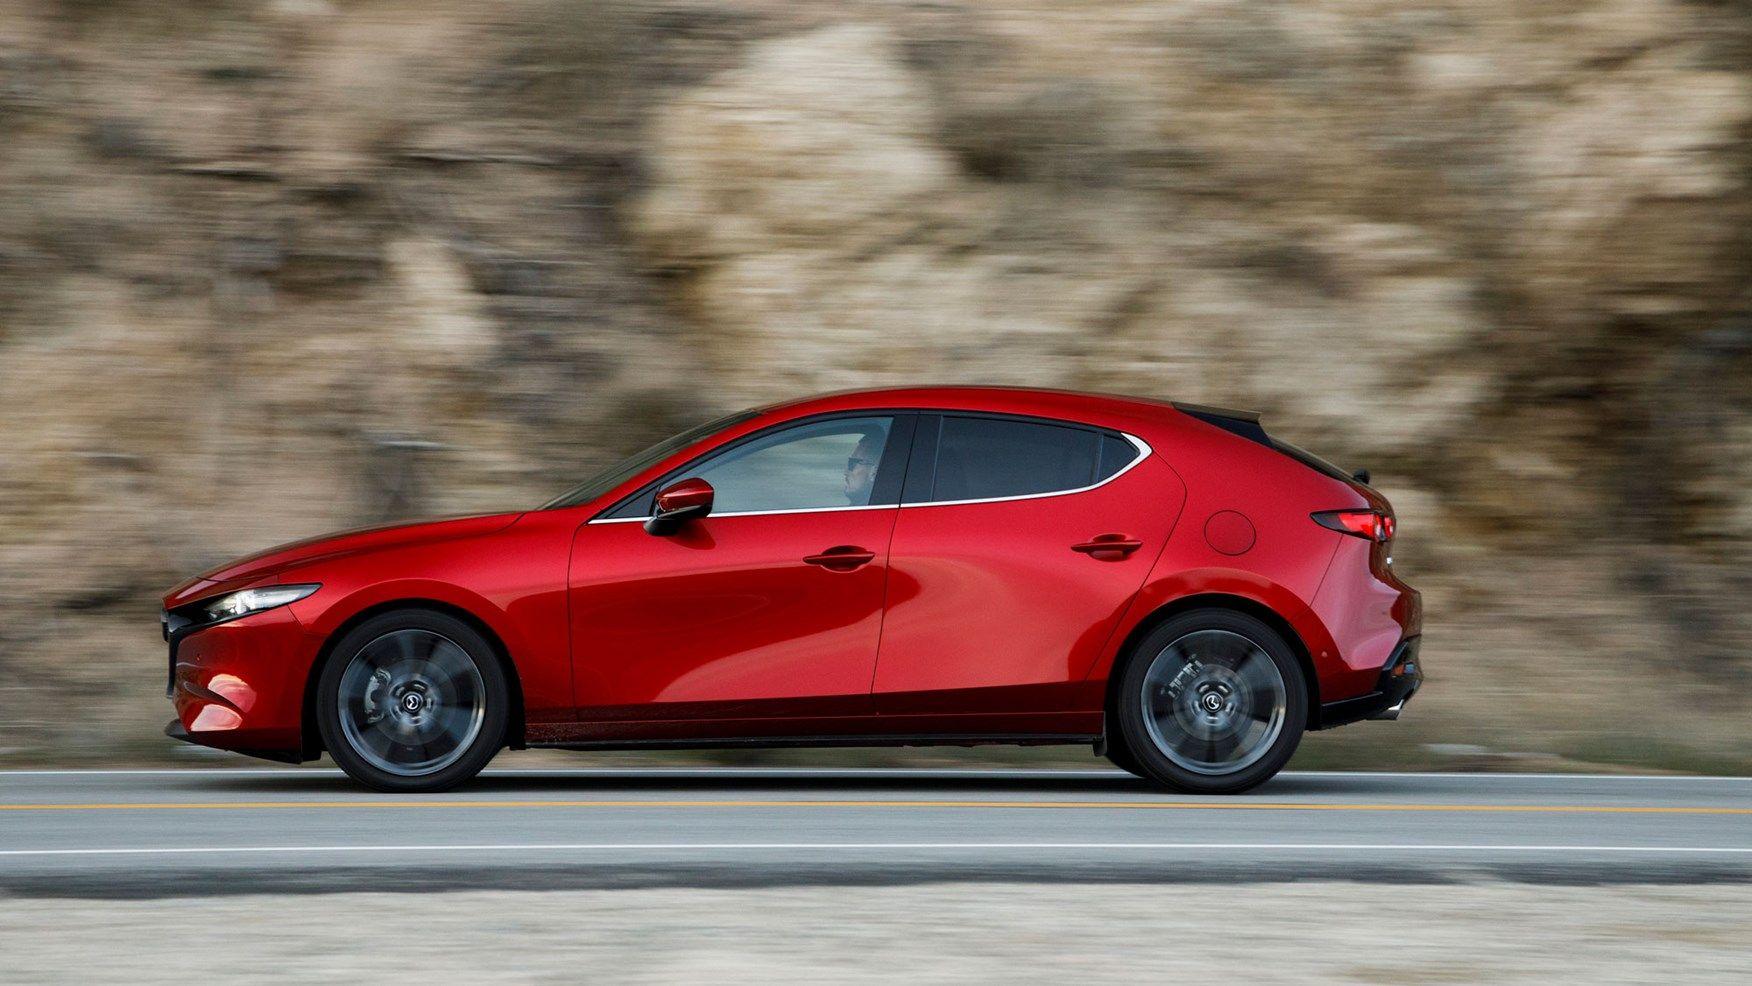 New Mazda 3 2019 Review Raising The Game Car Magazine Mazda Mazda 3 Car Magazine